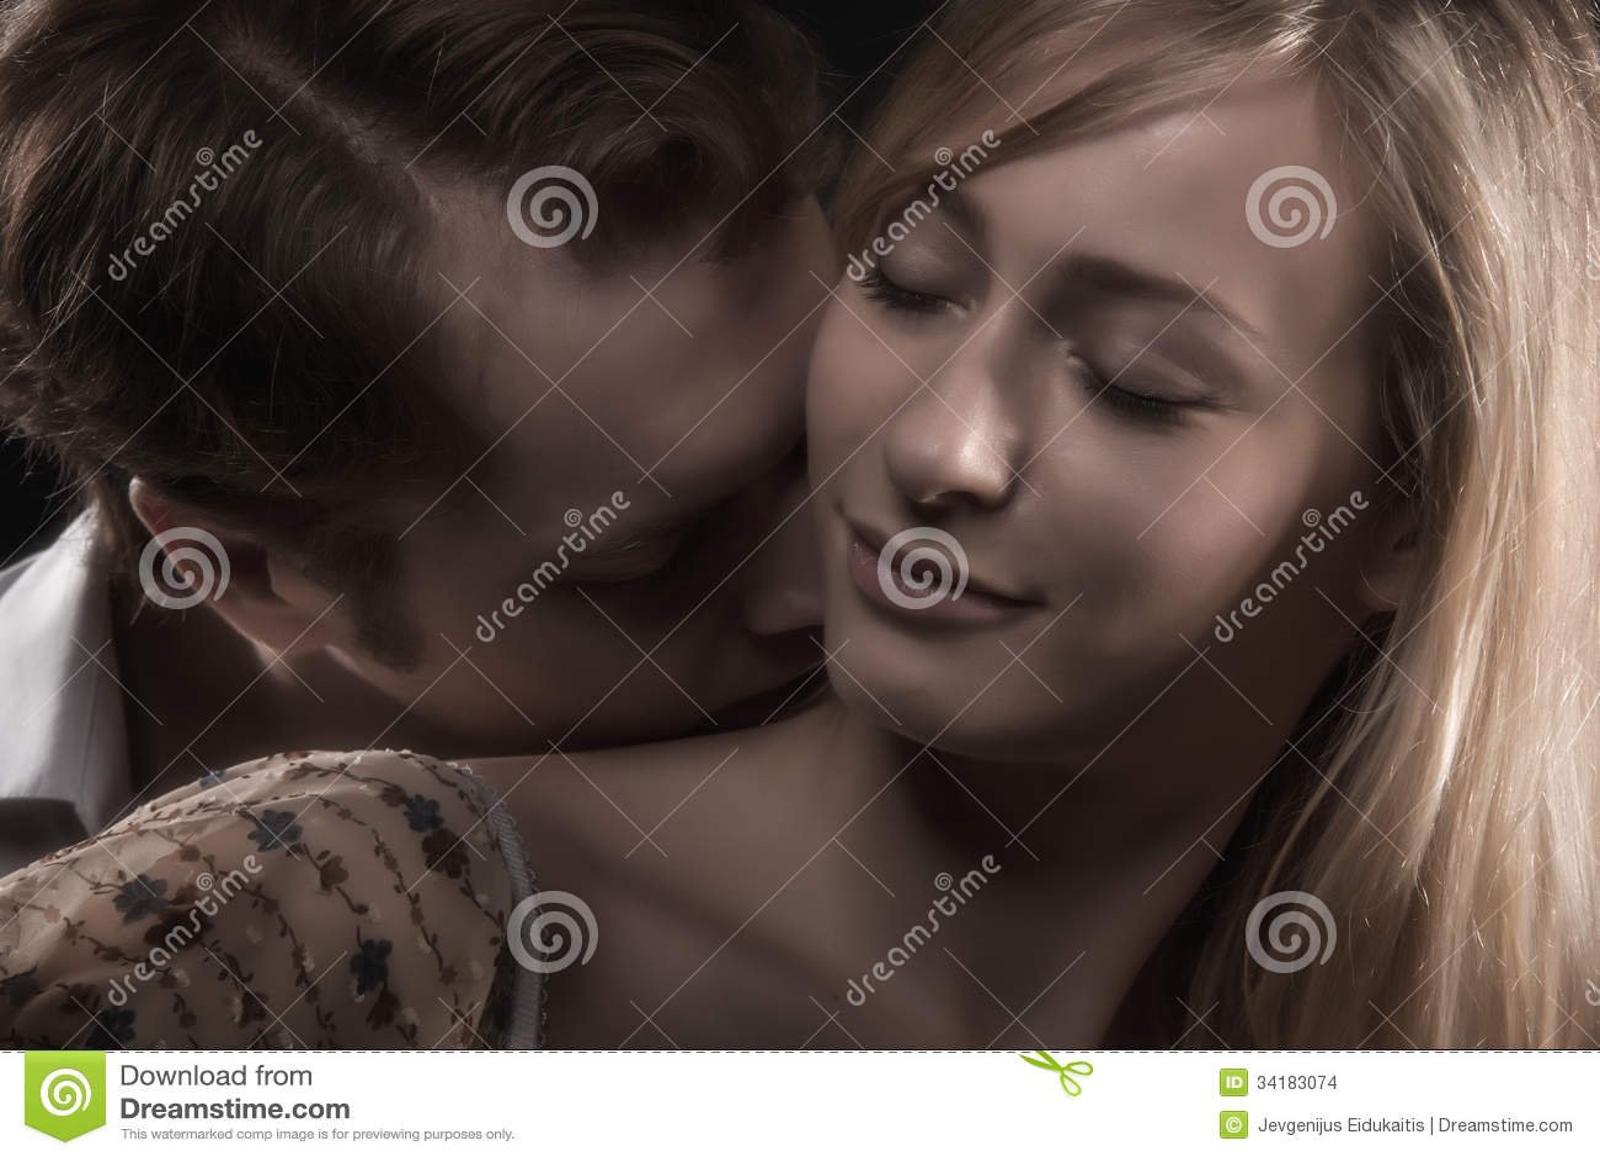 Sweet Singles  THAI WOMEN ONLINE DATING WITH THAI BRIDES